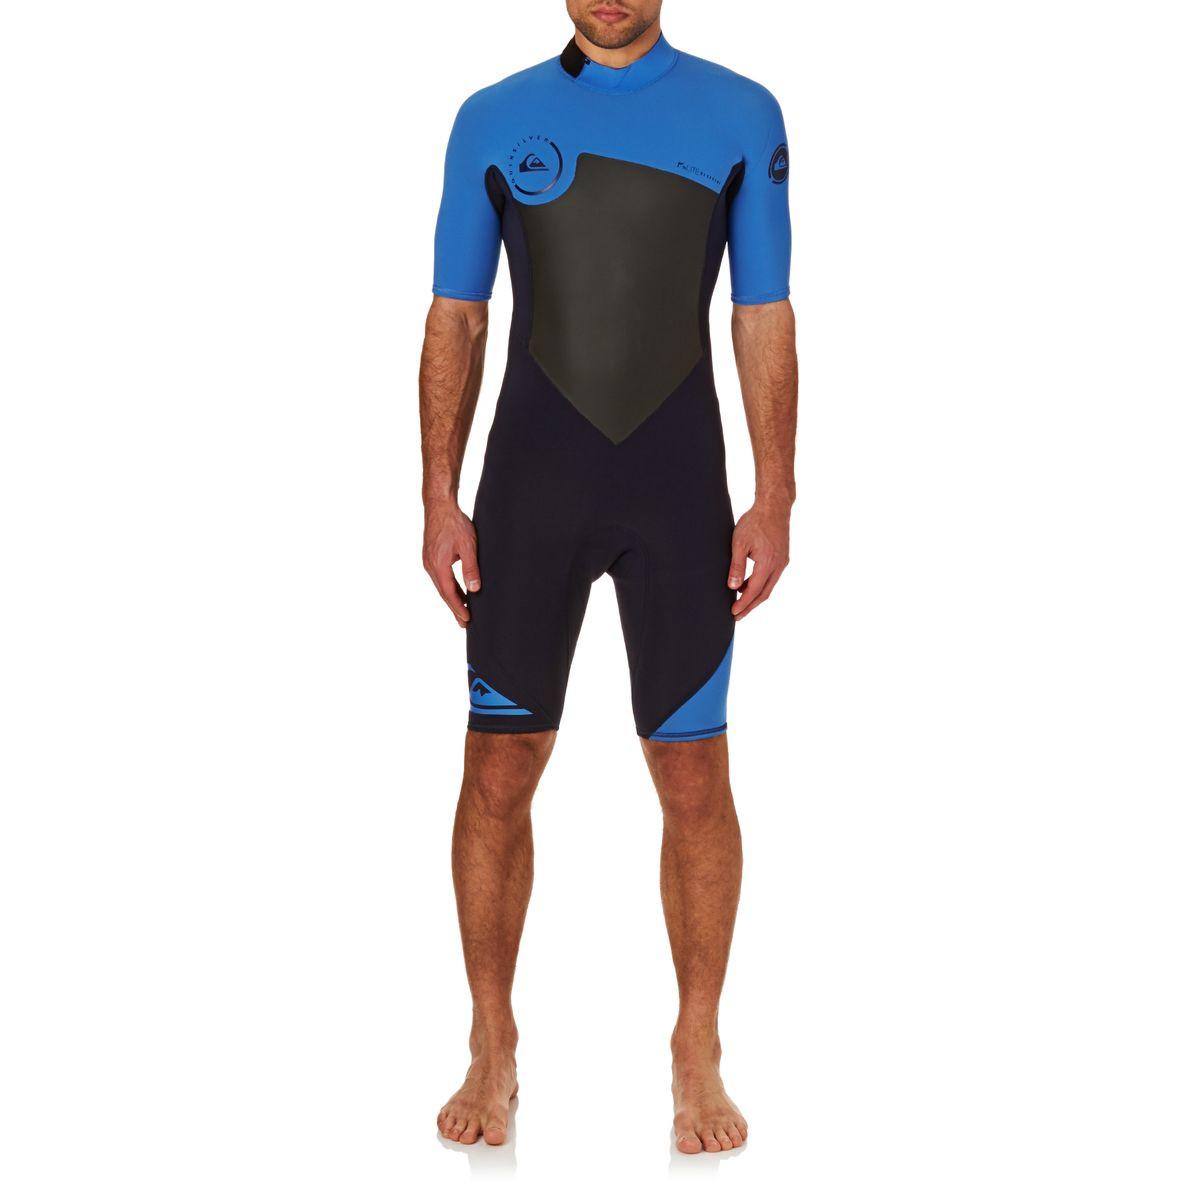 Quiksilver Syncro 2mm 2017 Back Zip Shorty Wetsuit - Navy Blazer